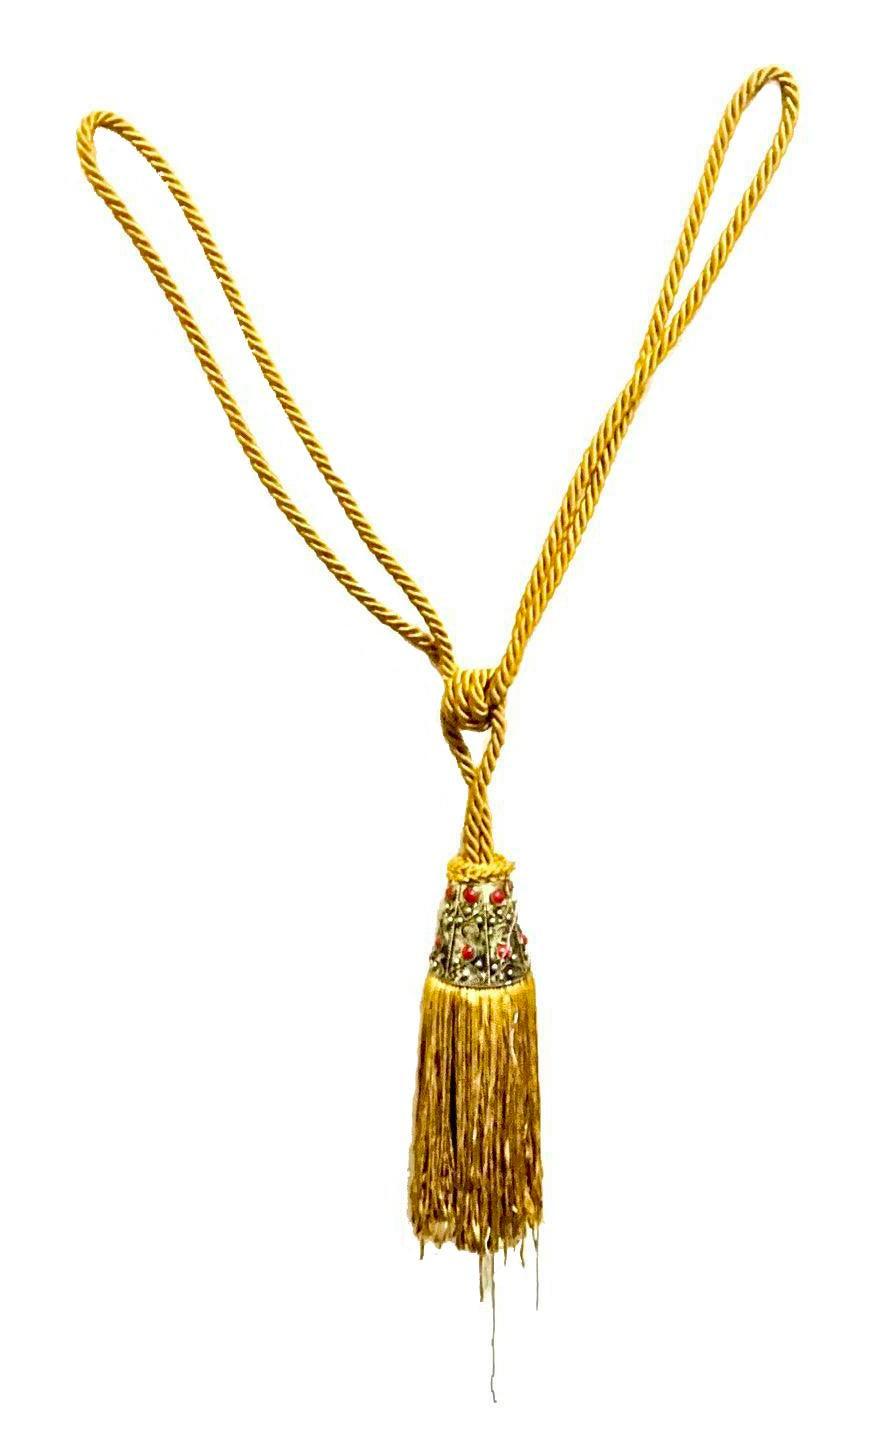 Hollywood Regency Ornate Saffron Key Tassel Chairish